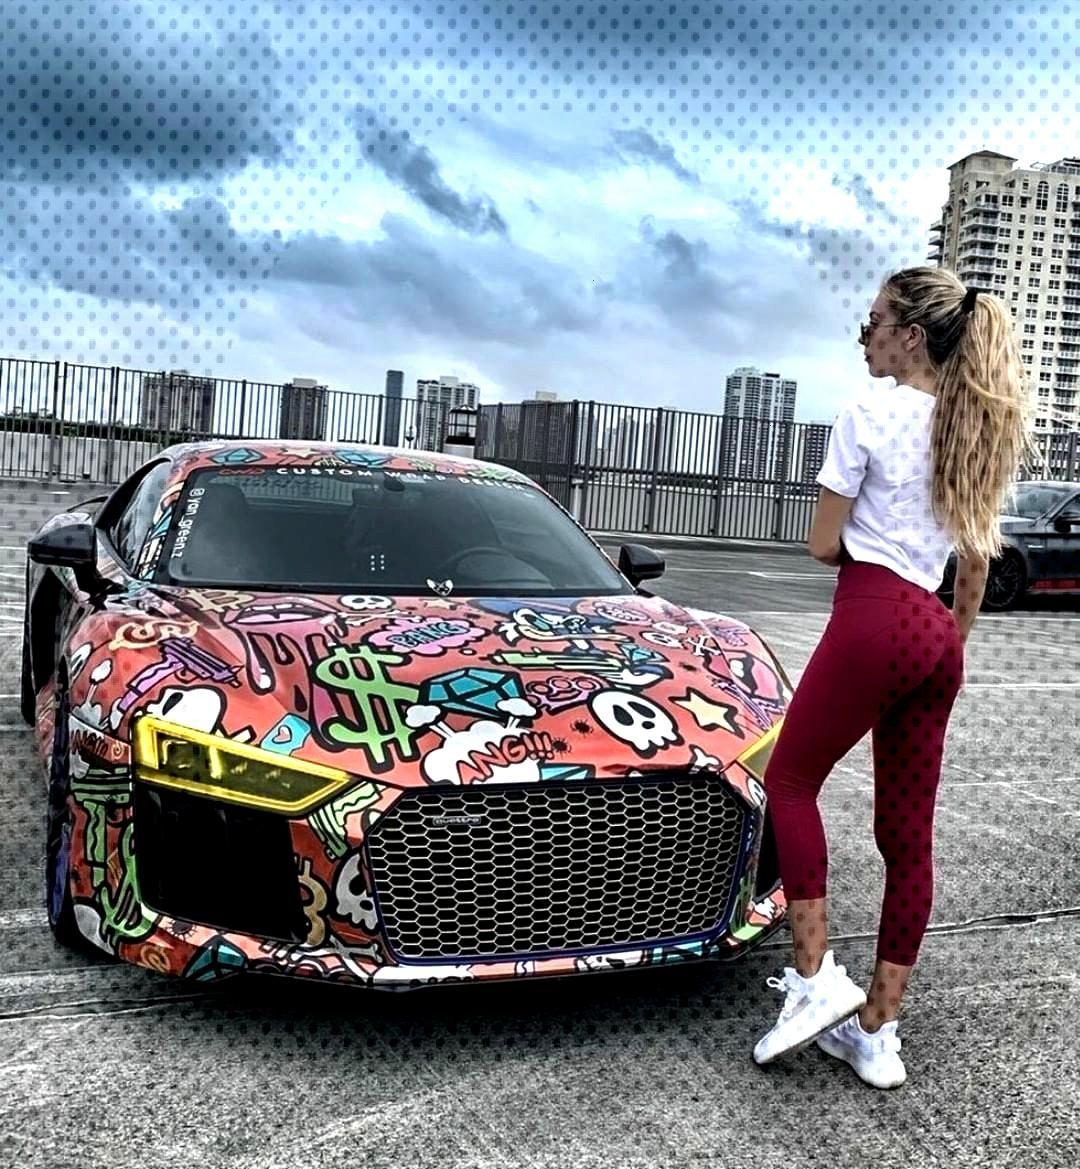 KingzMotors | Supercars  For more visit GymLive -->